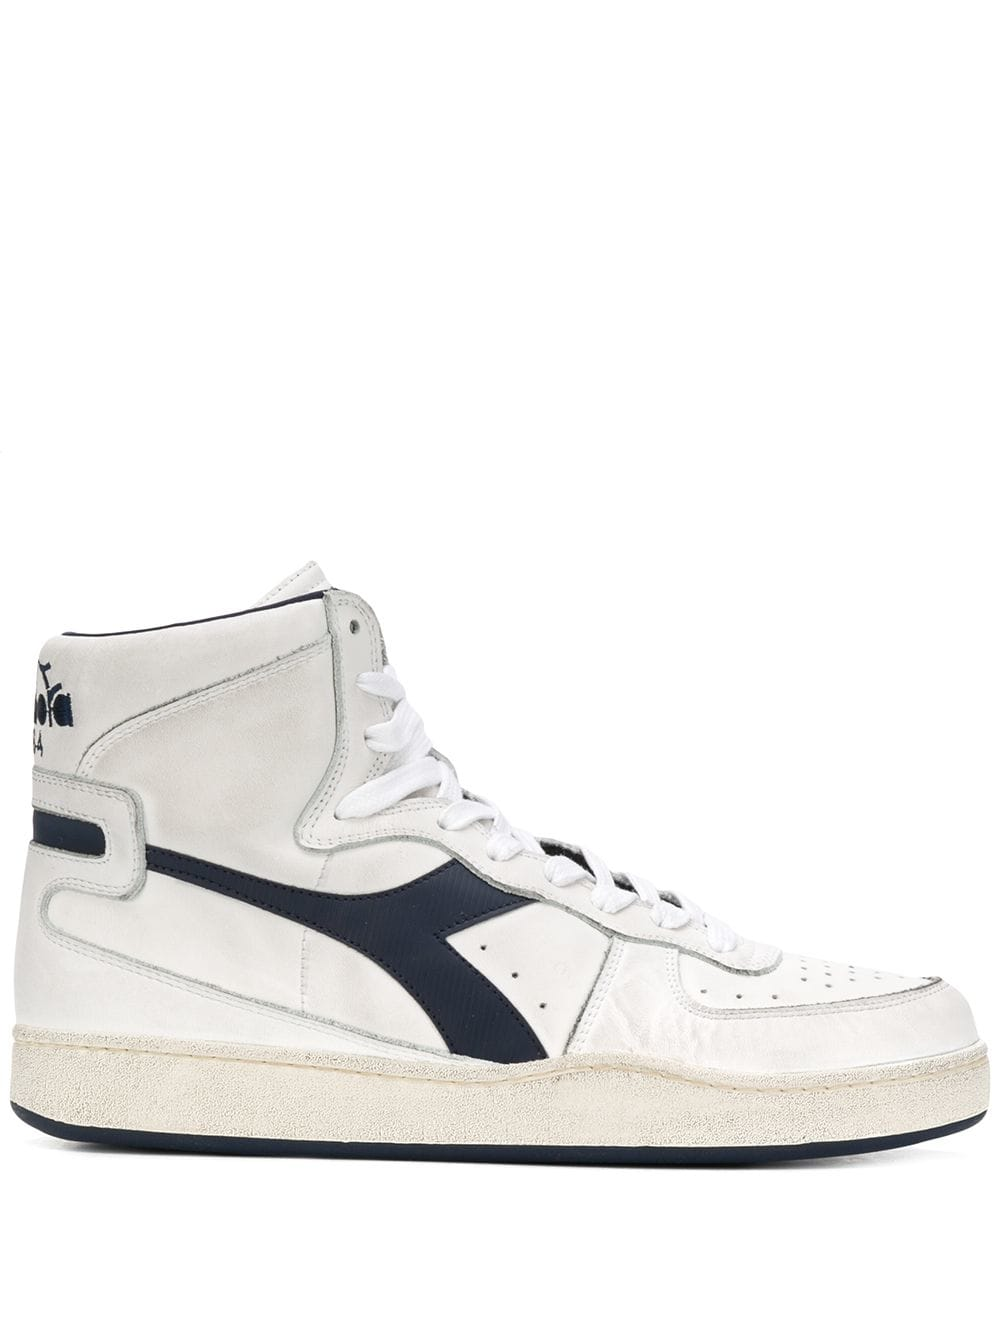 6610c49b Diadora Mi Basket hi-top sneakers - White in 2019 | Products ...